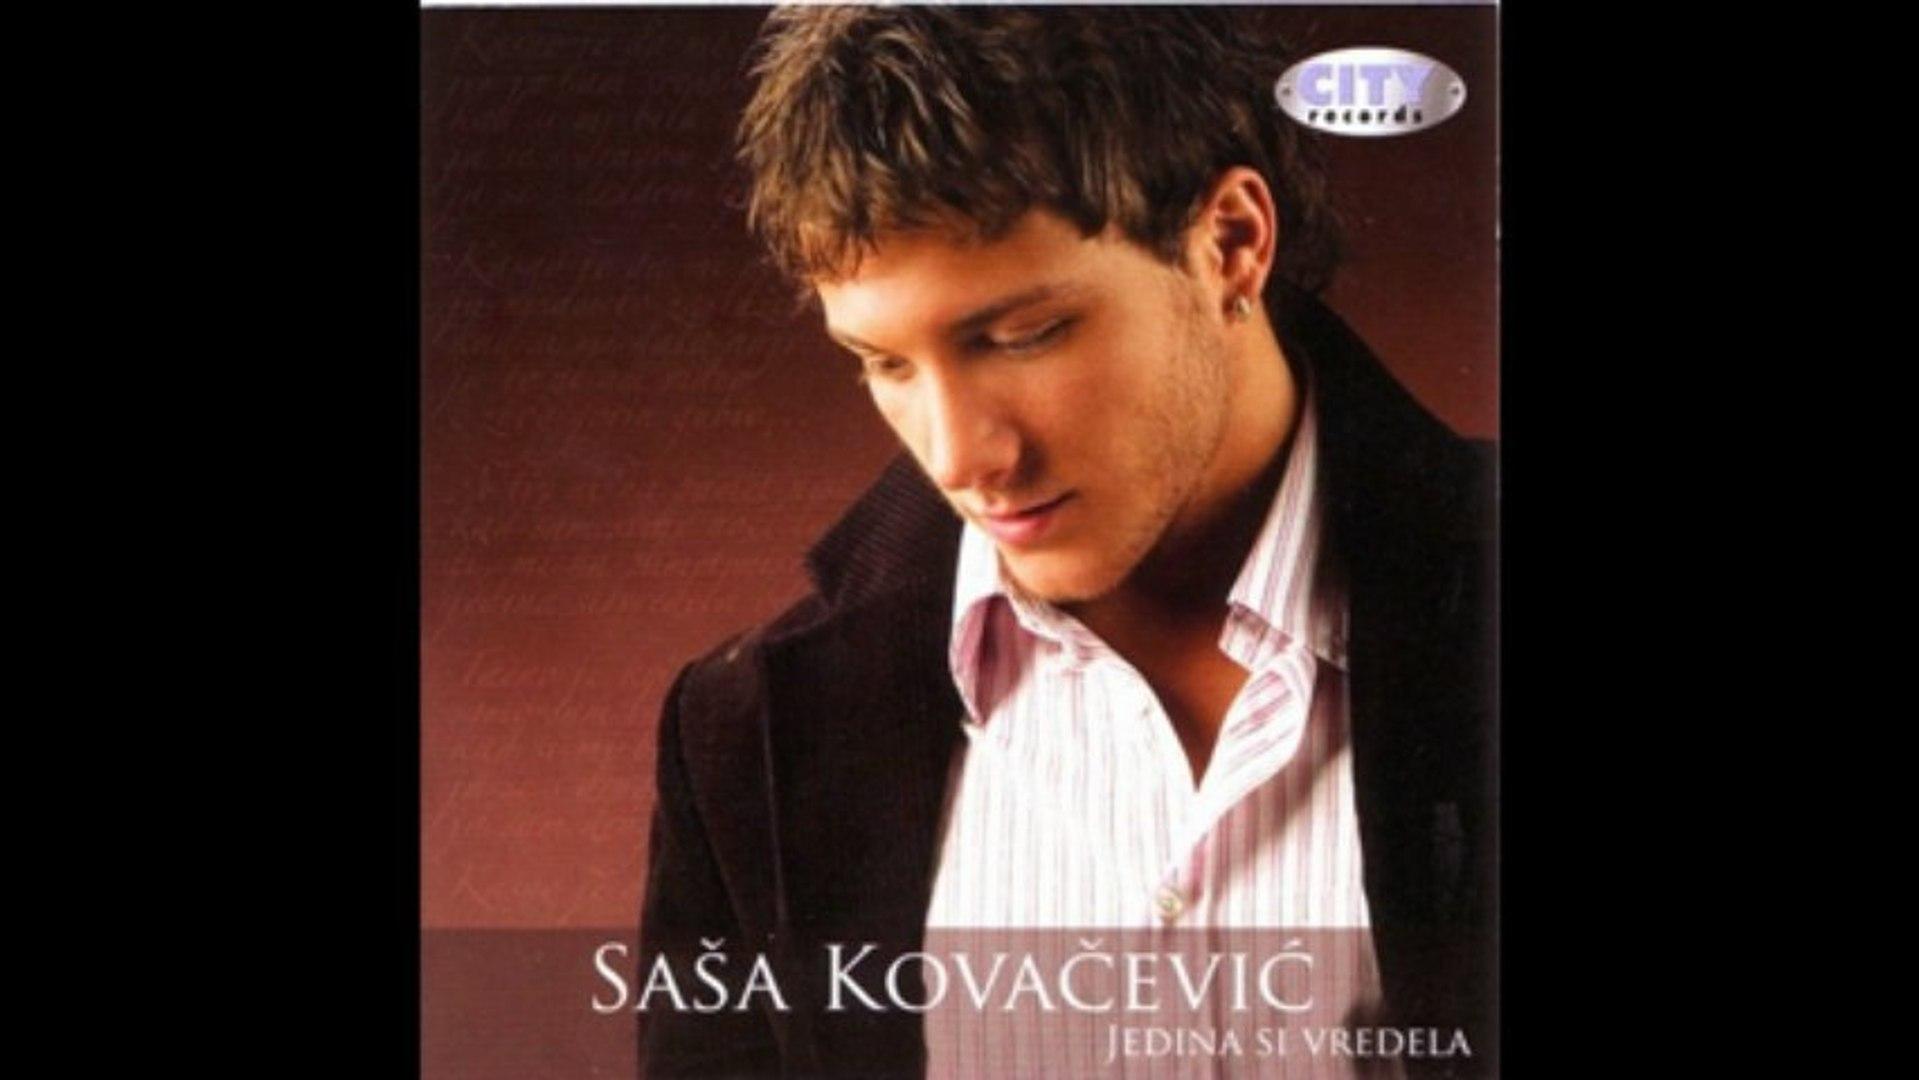 Sasa Kovacevic - Kada nisi tu - (Audio 2006) HD